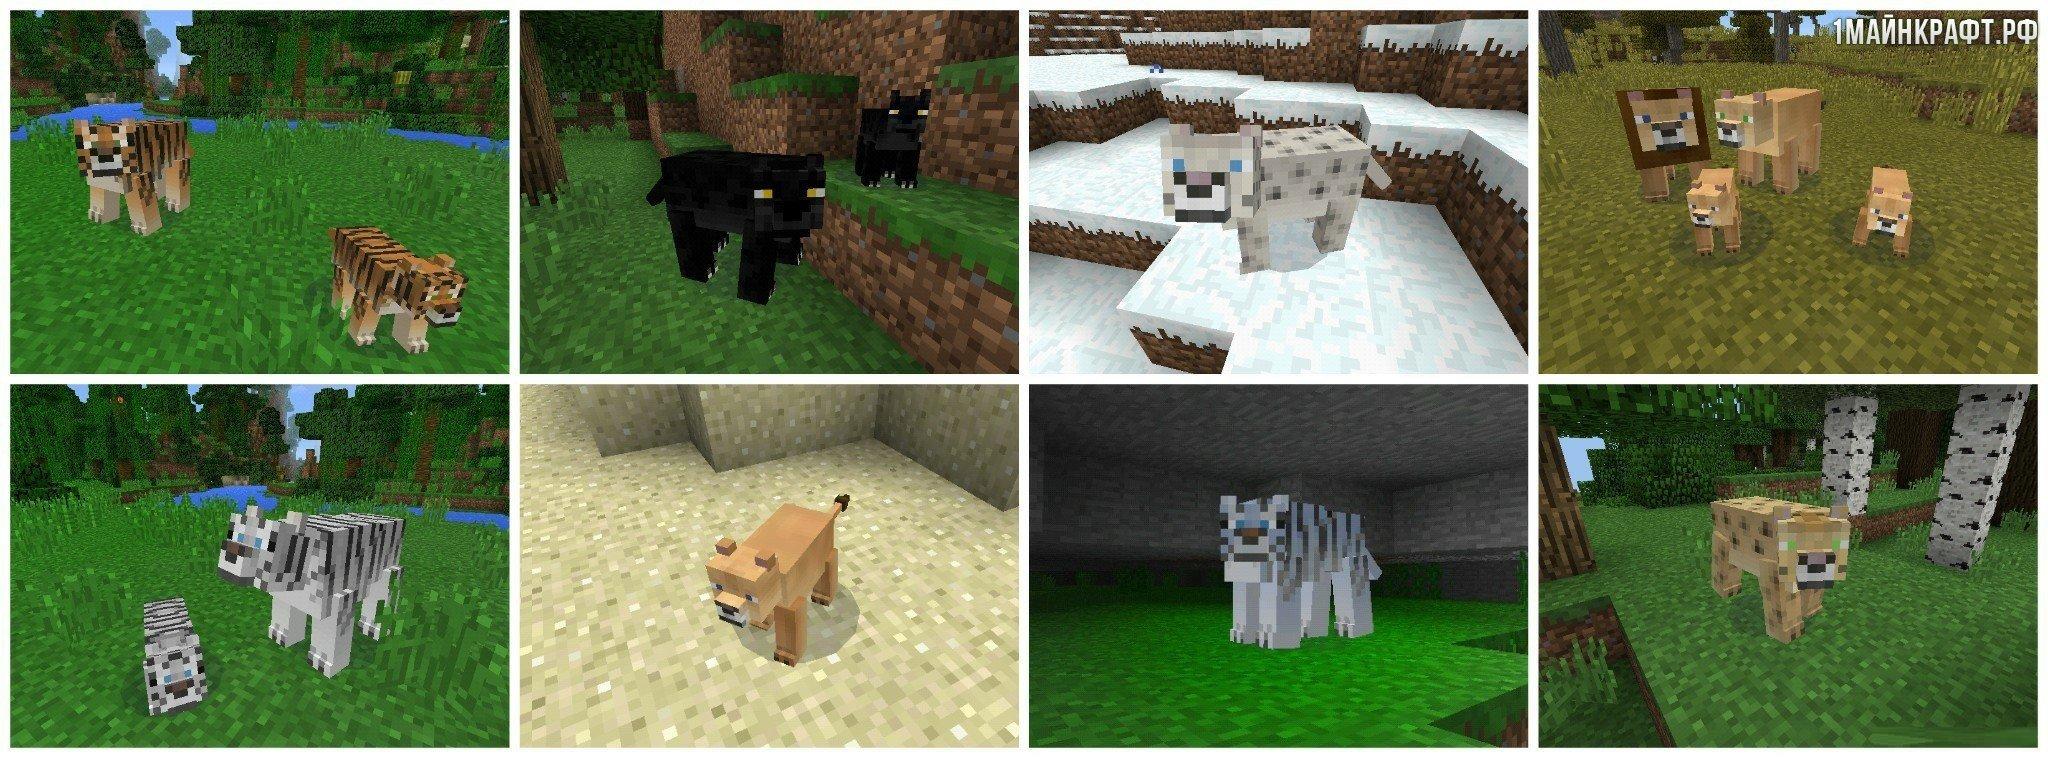 Моды на животных в Майнкрафт 1.7.10